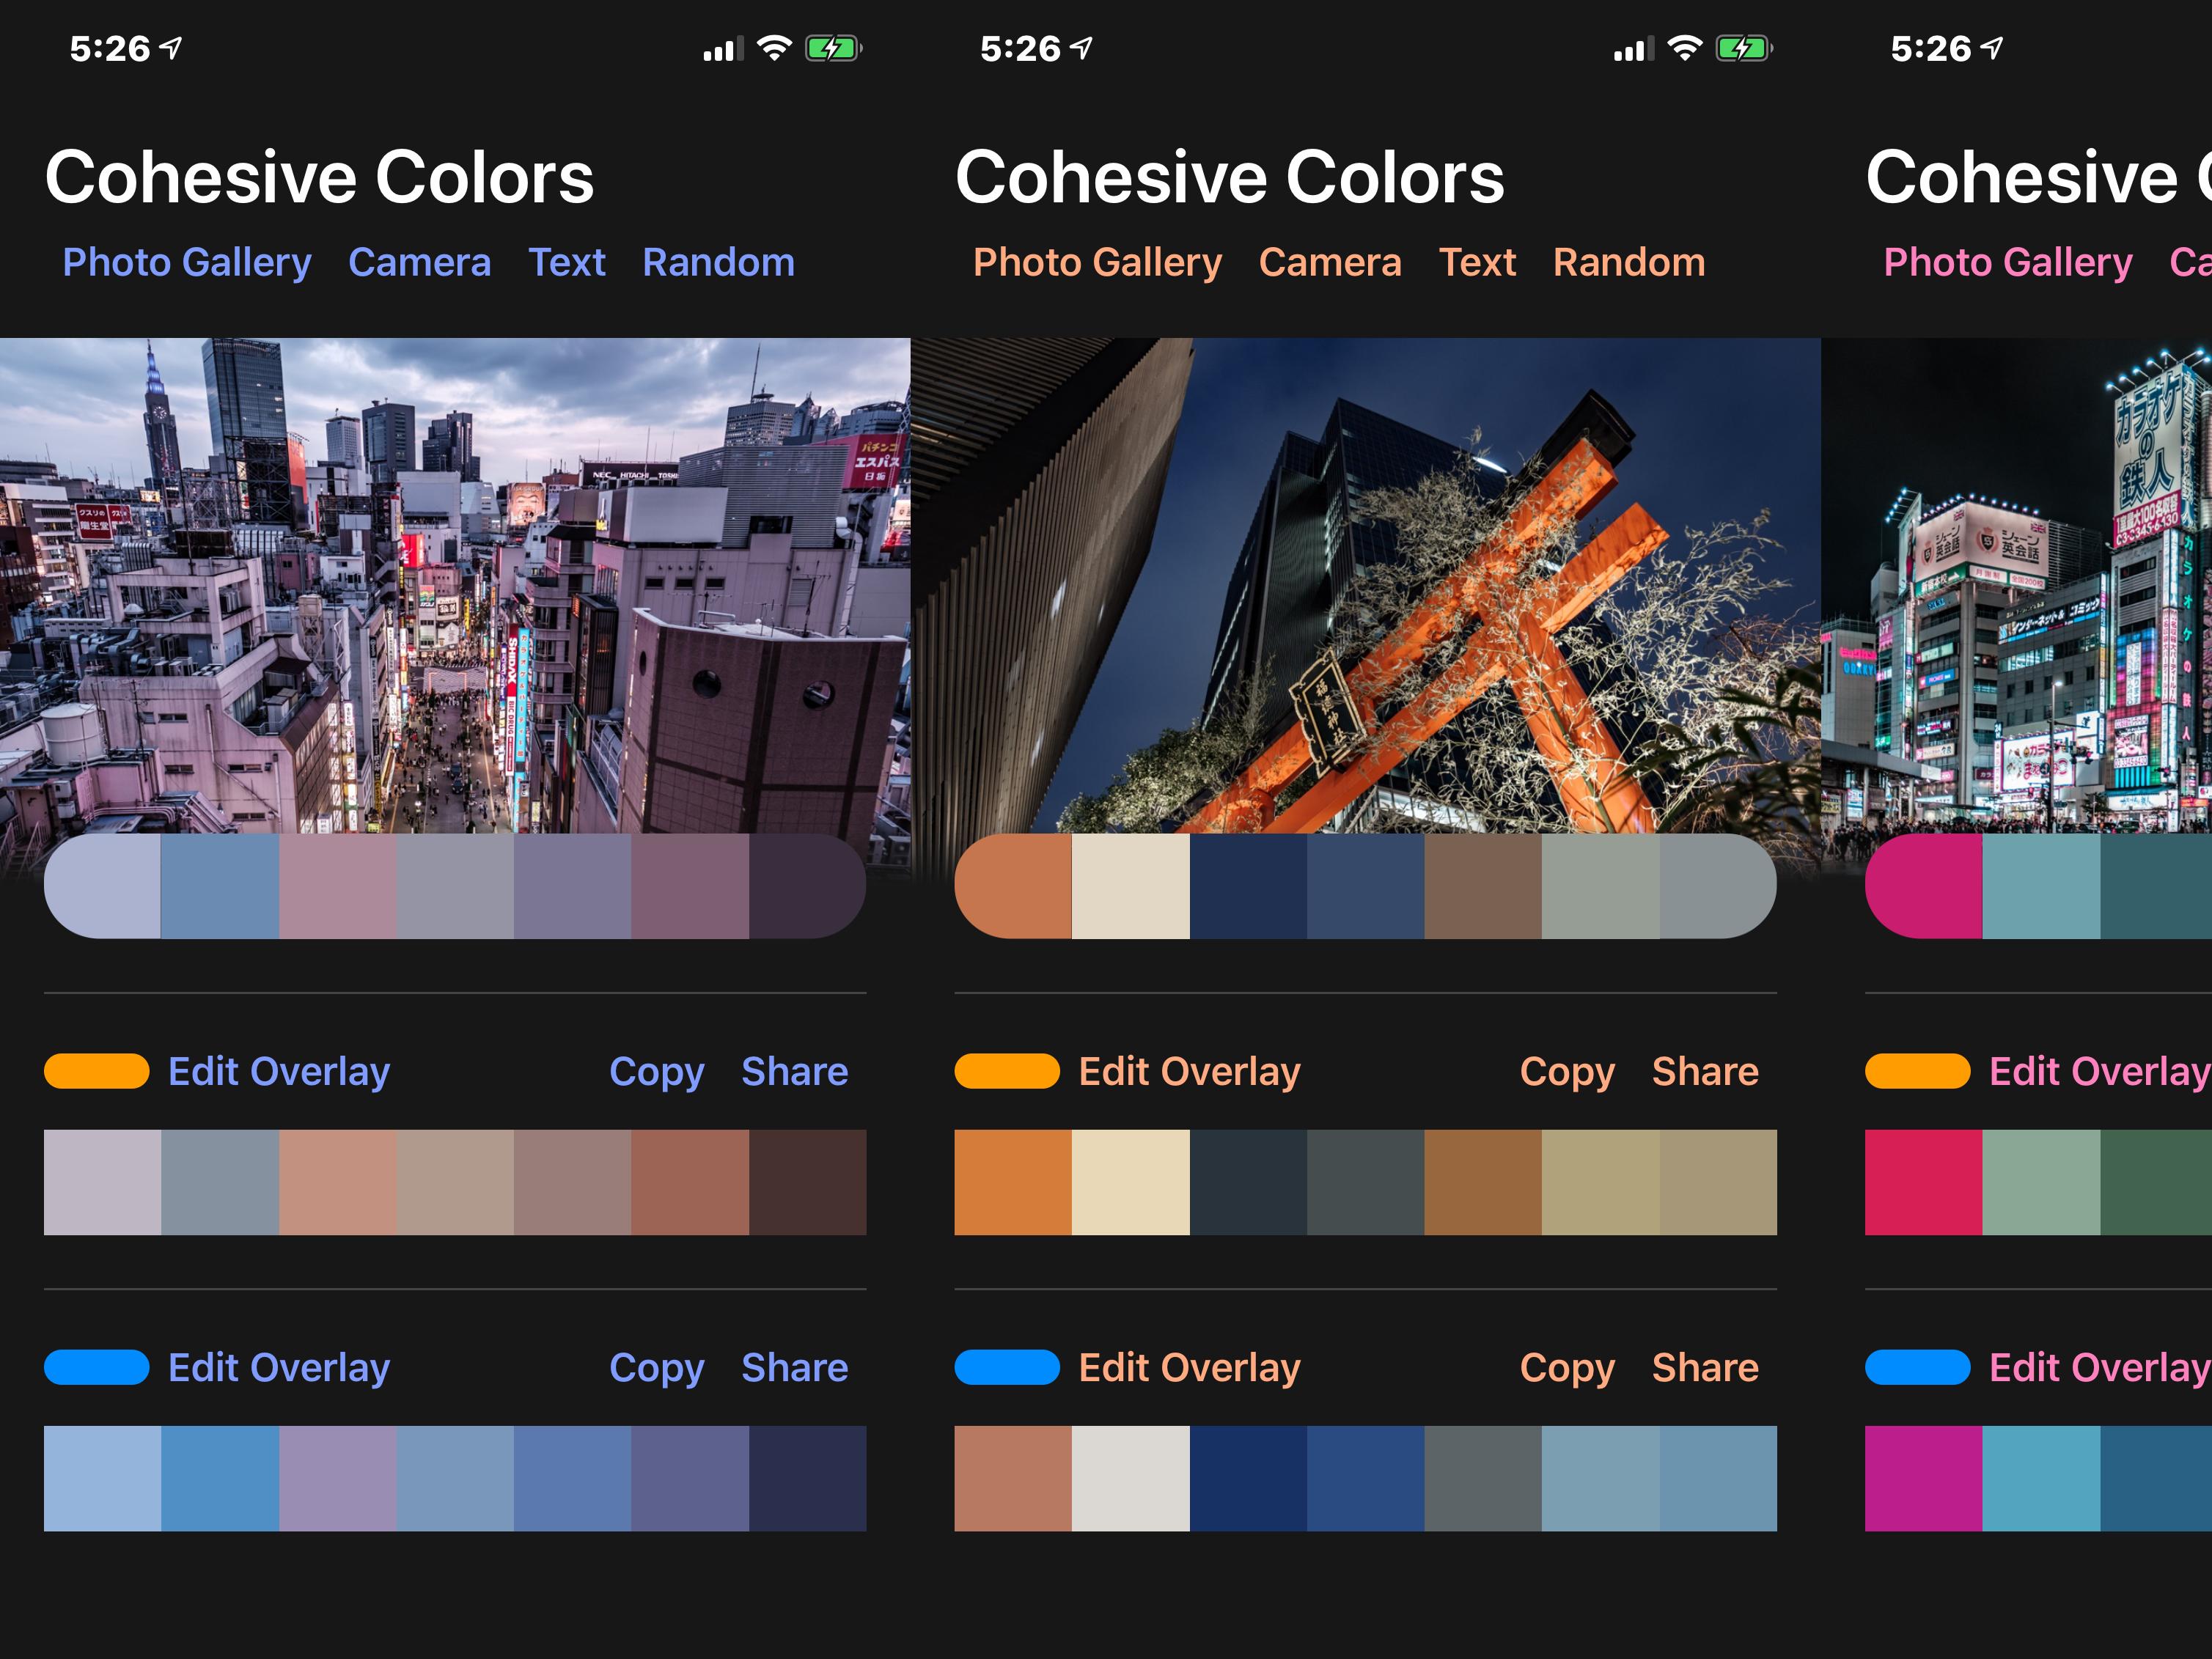 Cohesive colors